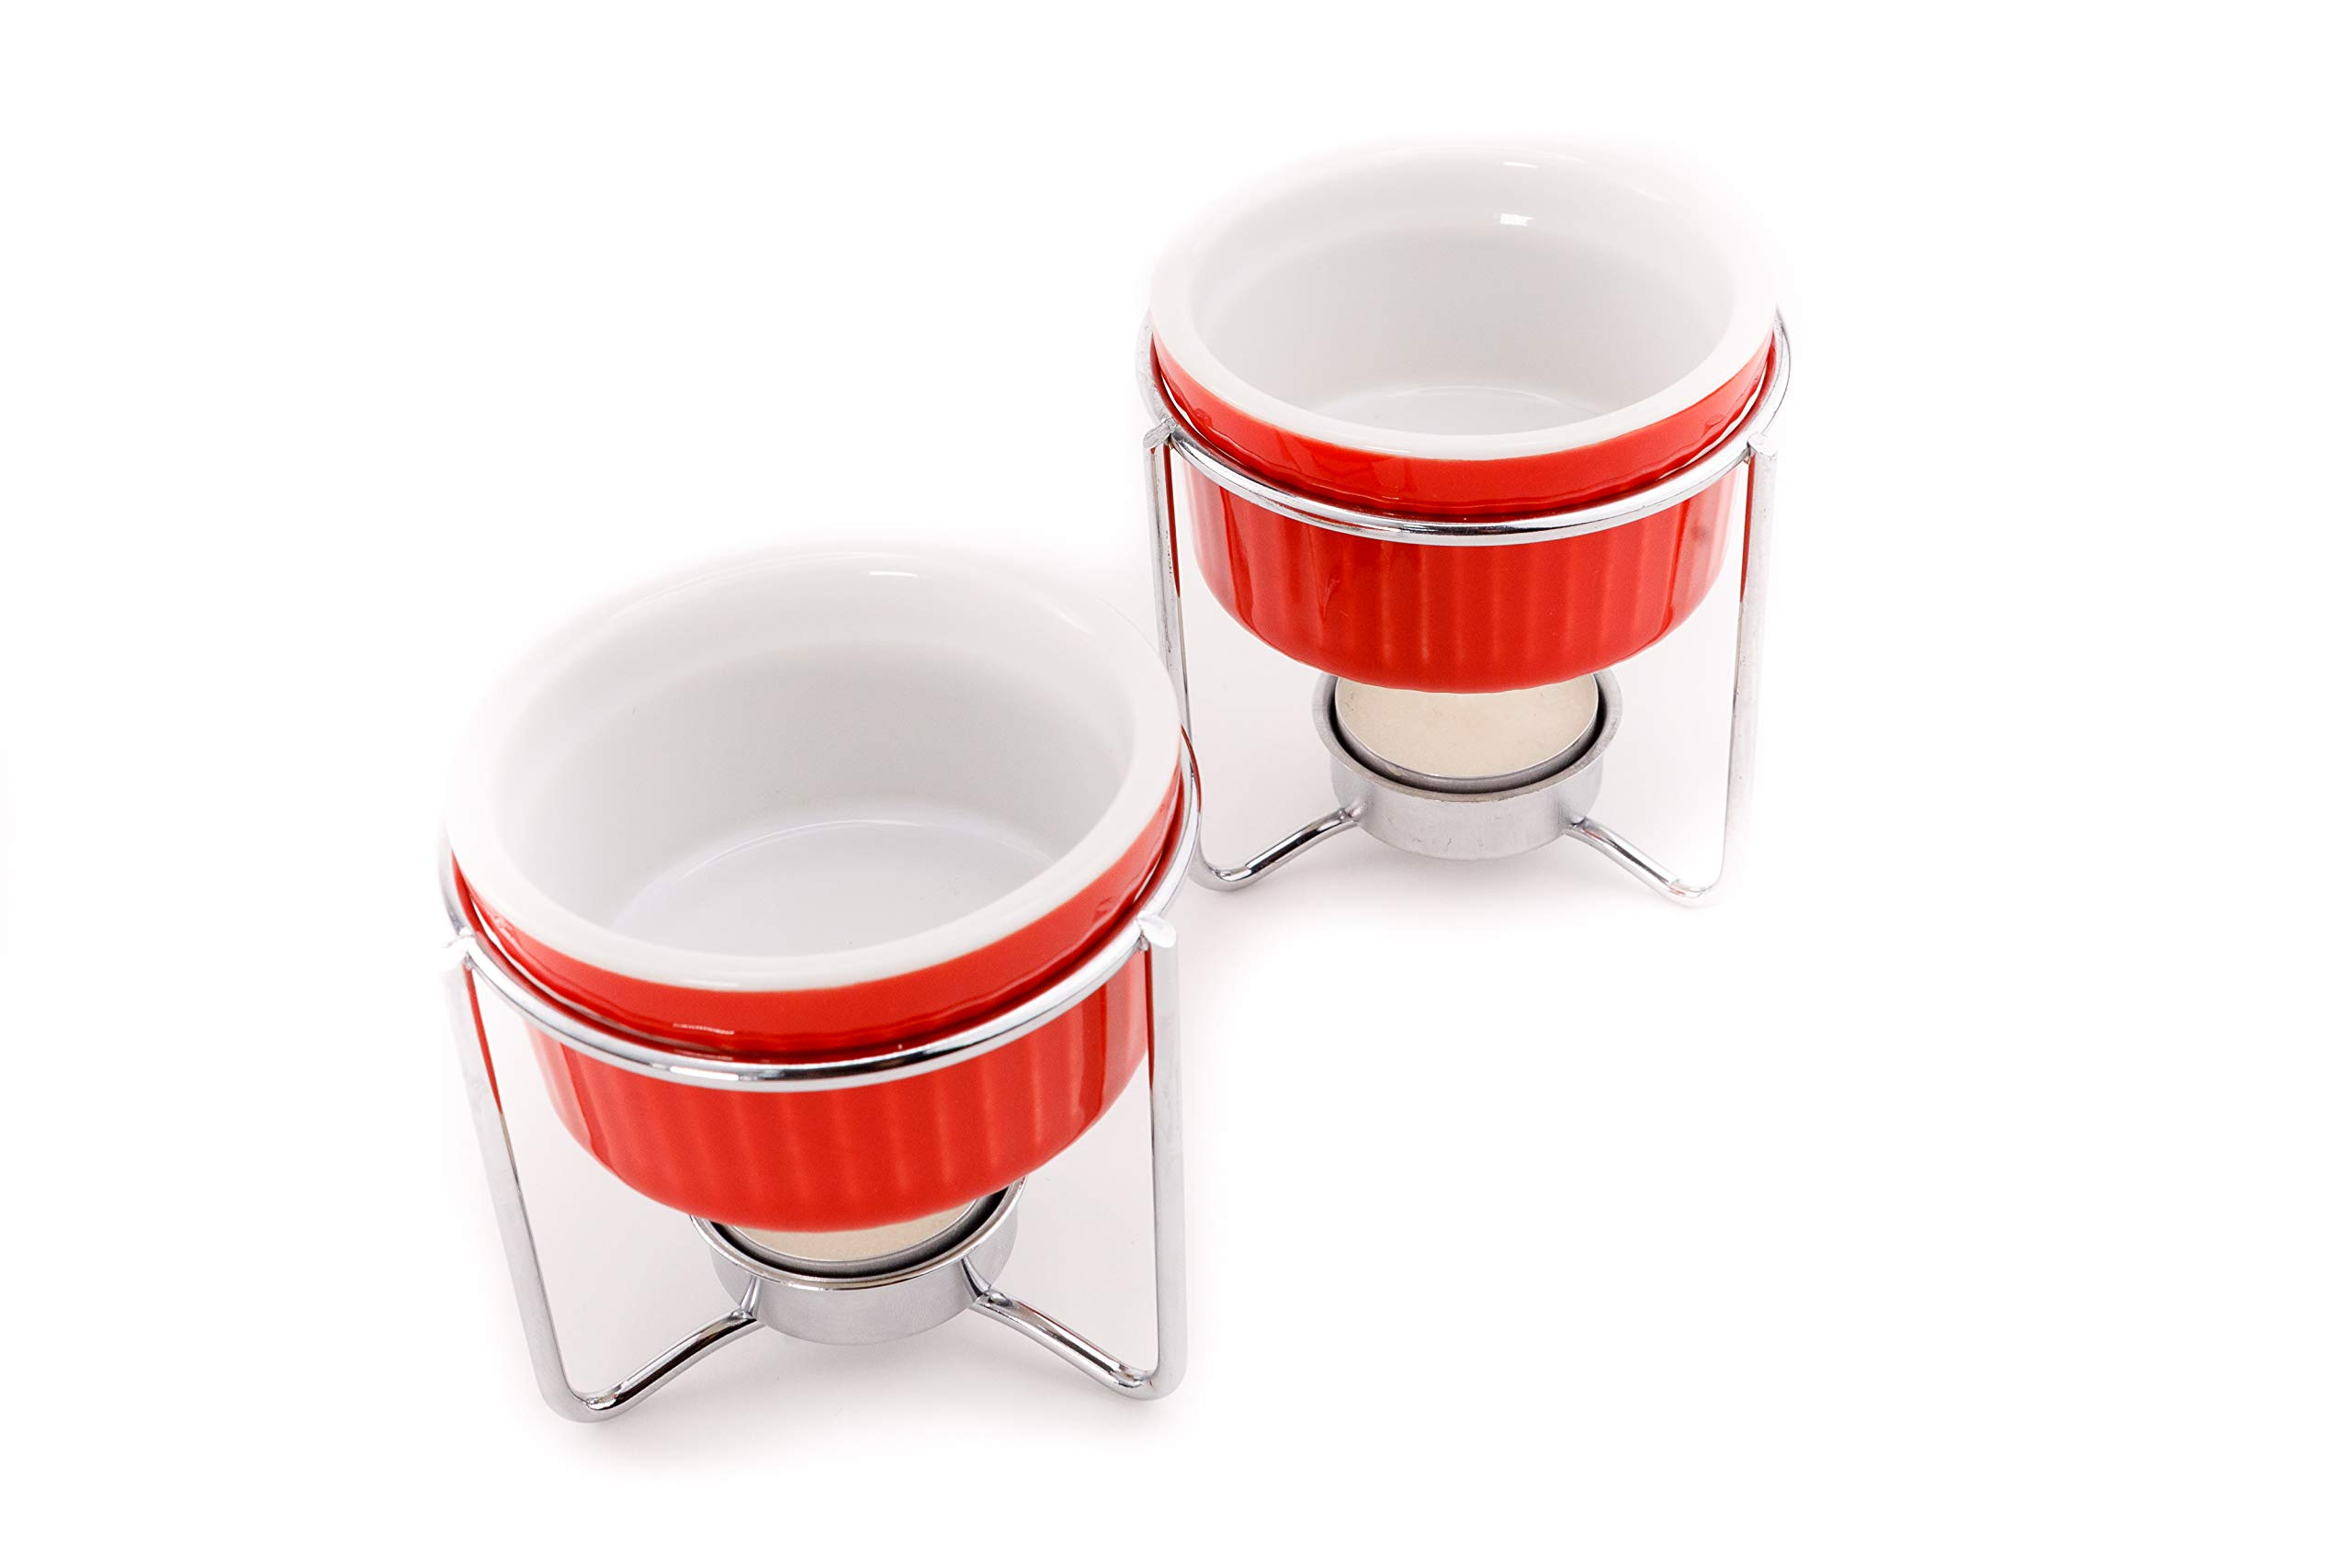 Crabaholik 2-Piece Ceramic Butter Warmer Set – Premium Quality Red Ceramic Fondue Warmers – Butter Melters with Sturdy Metallic Stands – Dishwasher Safe – Elegant Design – Original Gift Idea